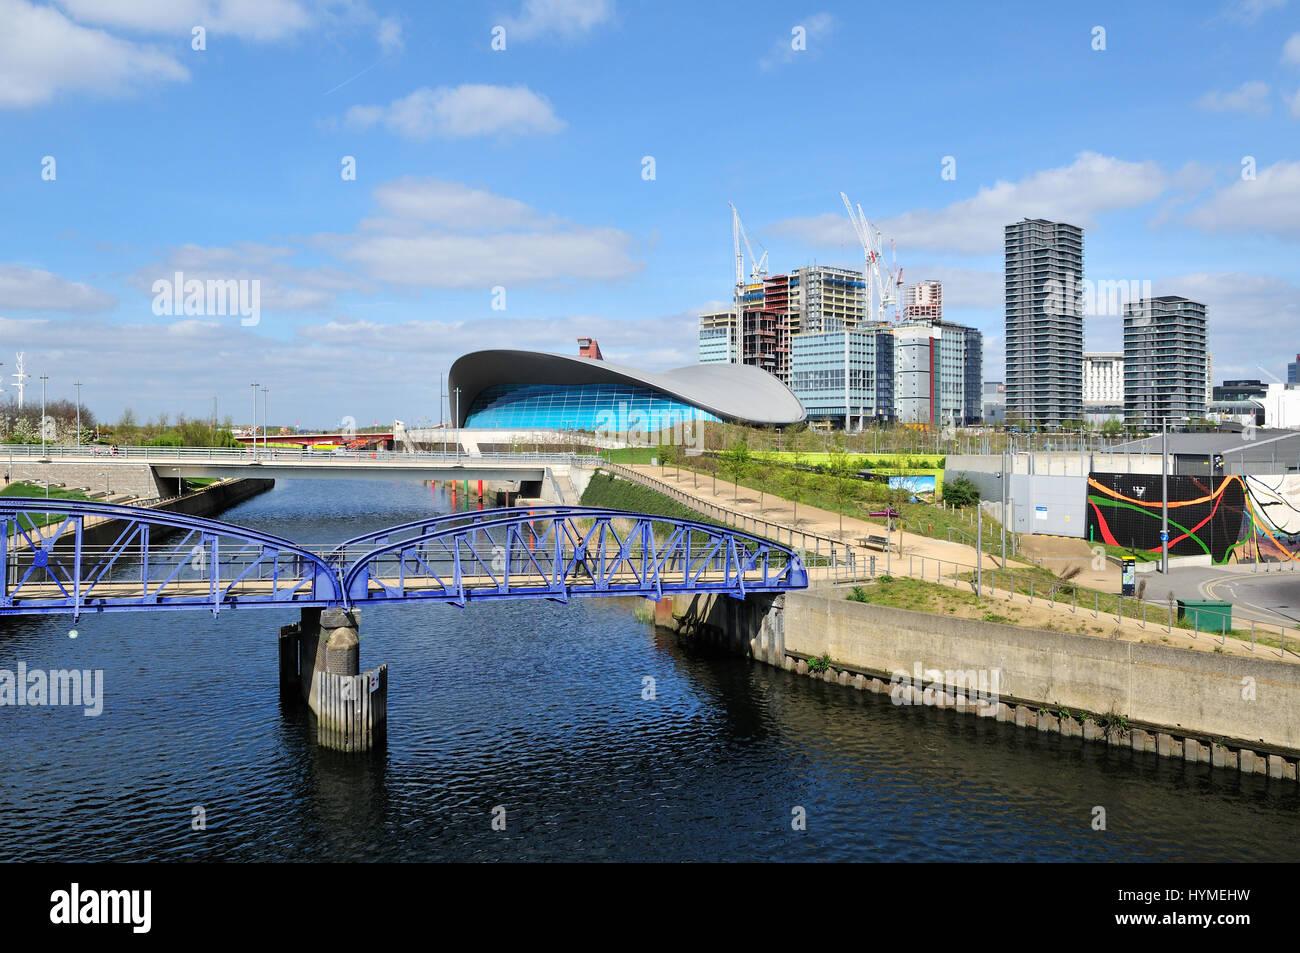 New buildings, new bridge and the London Aquatics Centre at Stratford, East London UK - Stock Image